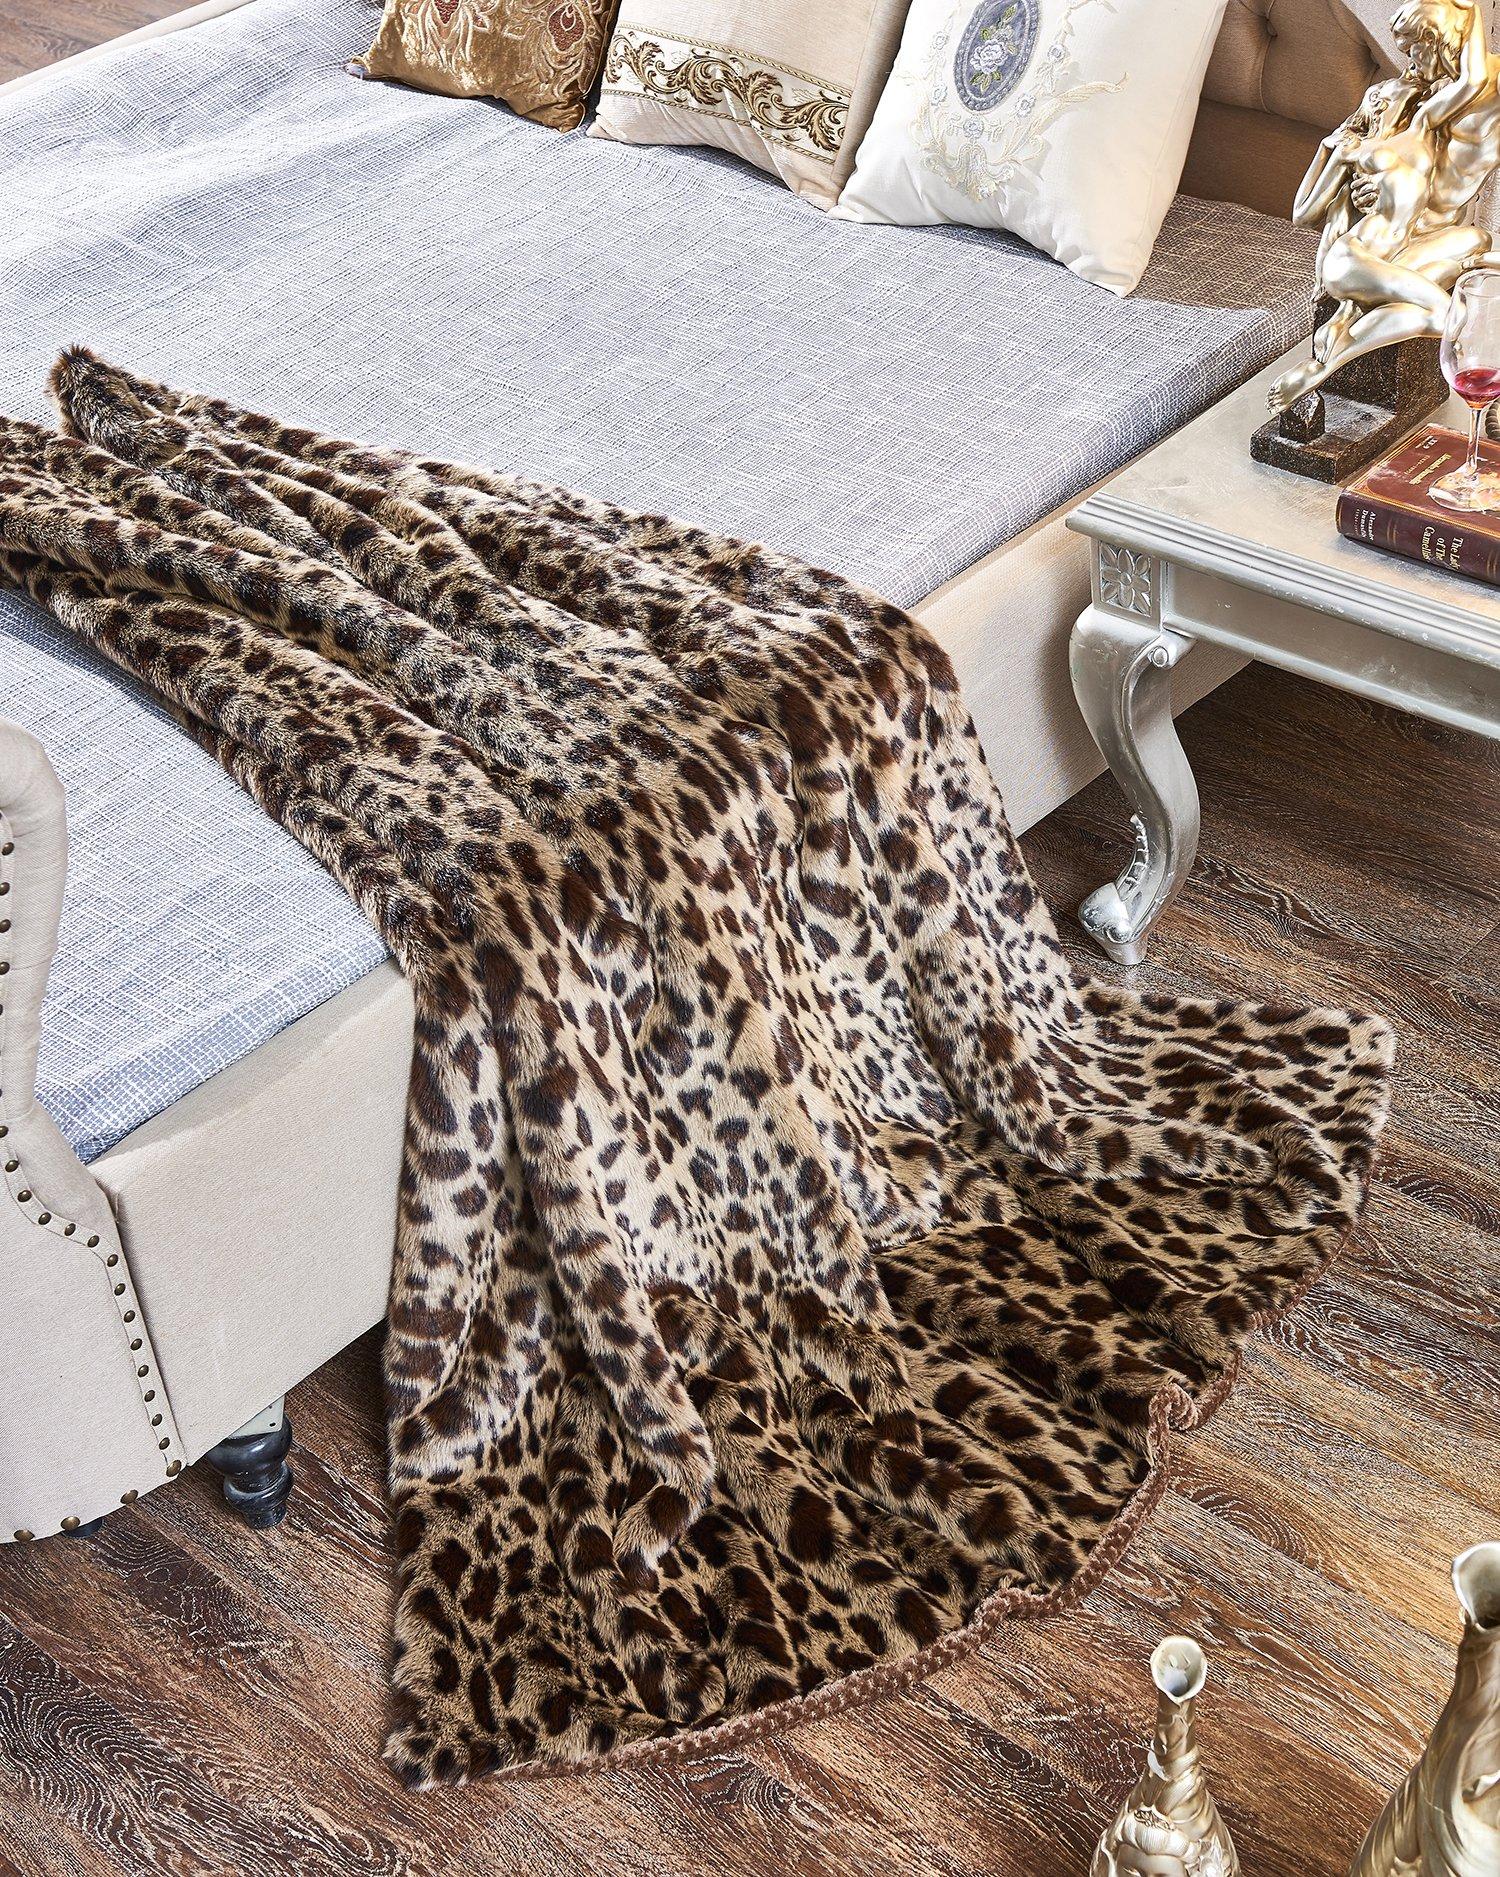 Lindsey Home Fashion Faux Fur Throw, Fur Blankets Super Soft Japanese Kanekalon Fiber, Sheepskin, Mink, Wolf, Bear, 60''x80'', 60''x70'', 50''x60'' 14 Colors (60x70(INCH), Dark Leopard) by Lindsey Home Fashion (Image #4)